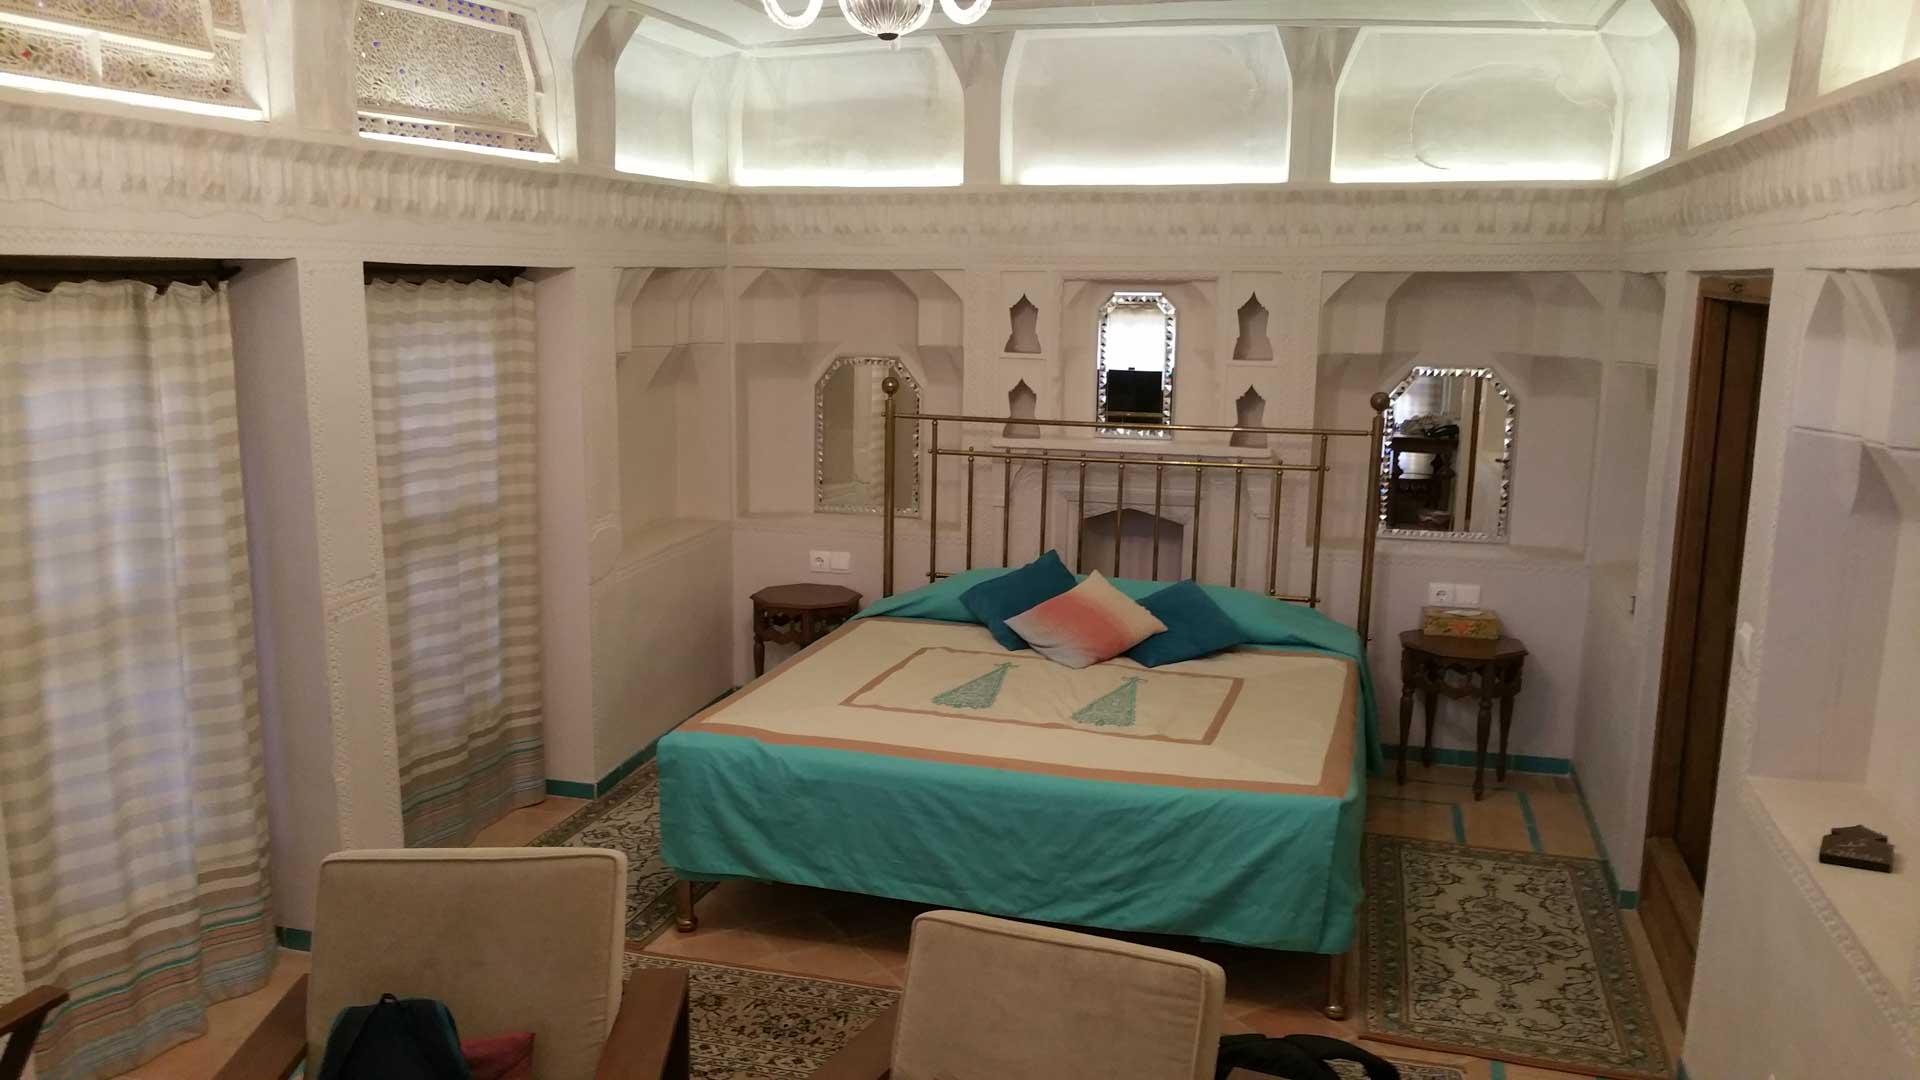 Saraye Ameriha Boutique Hotel room, kashan, iran, pescart, photo blog, travel blog, blog, photo travel blog, enrico pescantini, pescantini